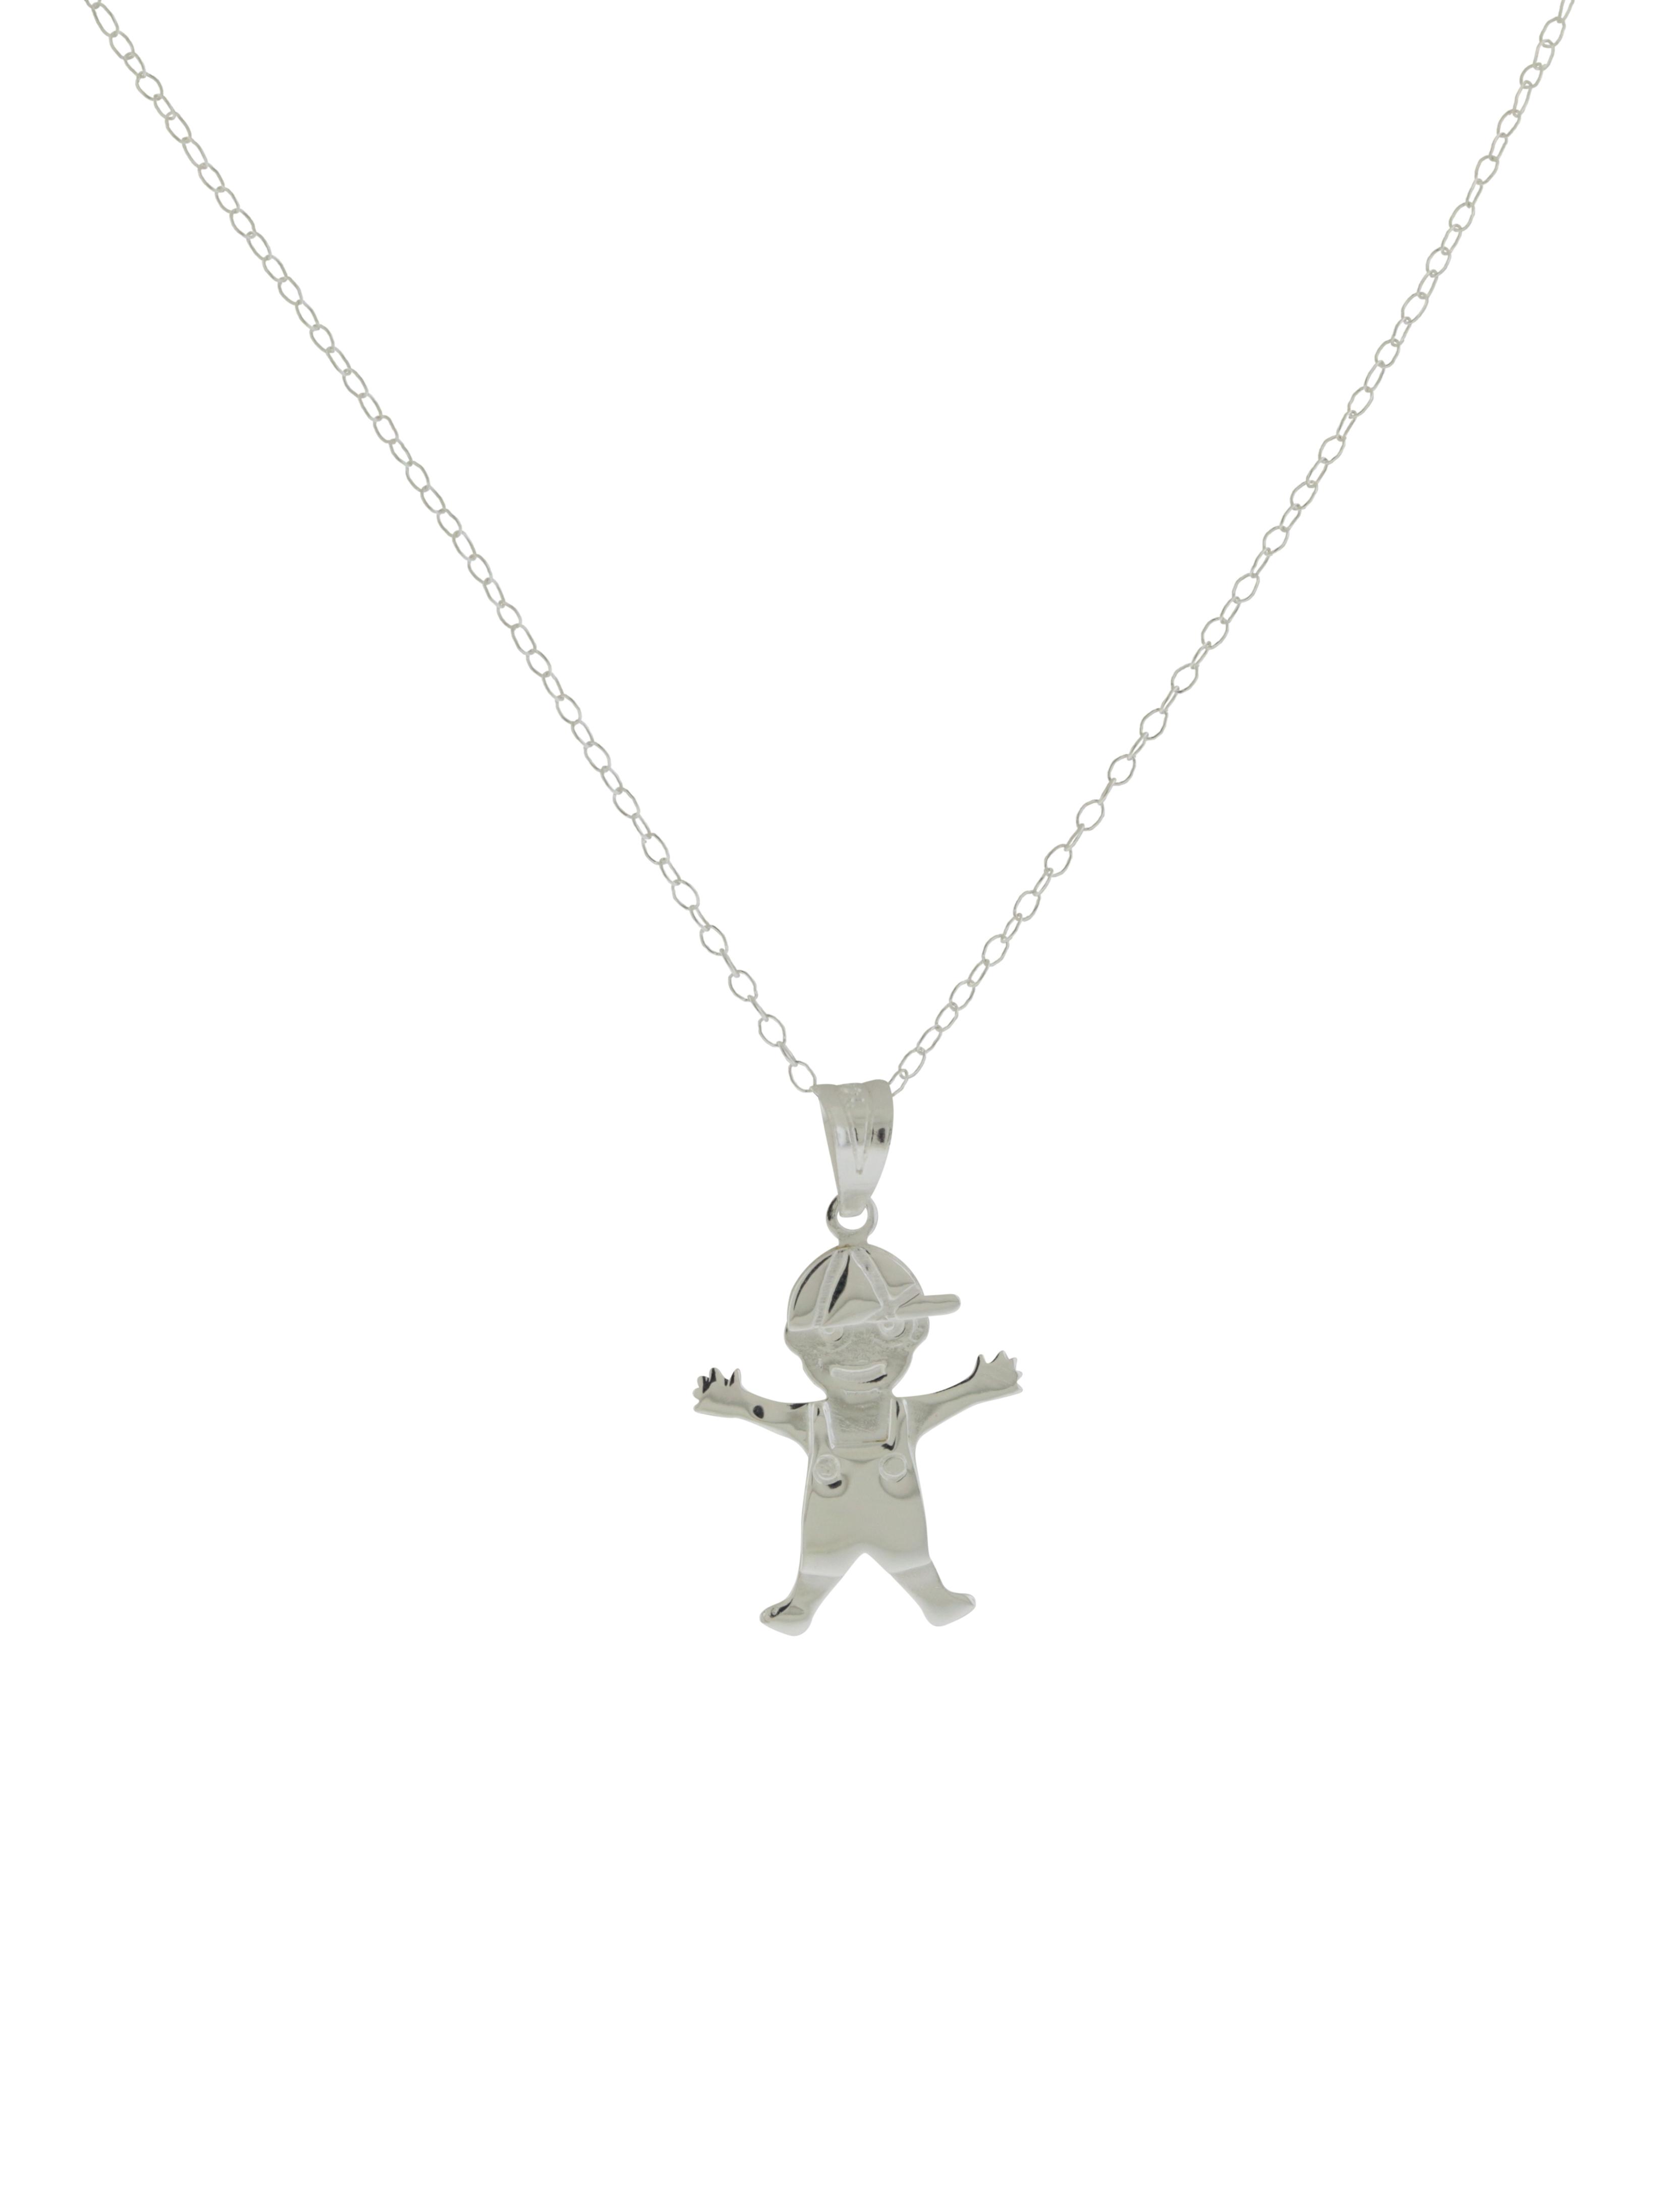 Sterling Silver Boy Pendant wih Chain - JP1803